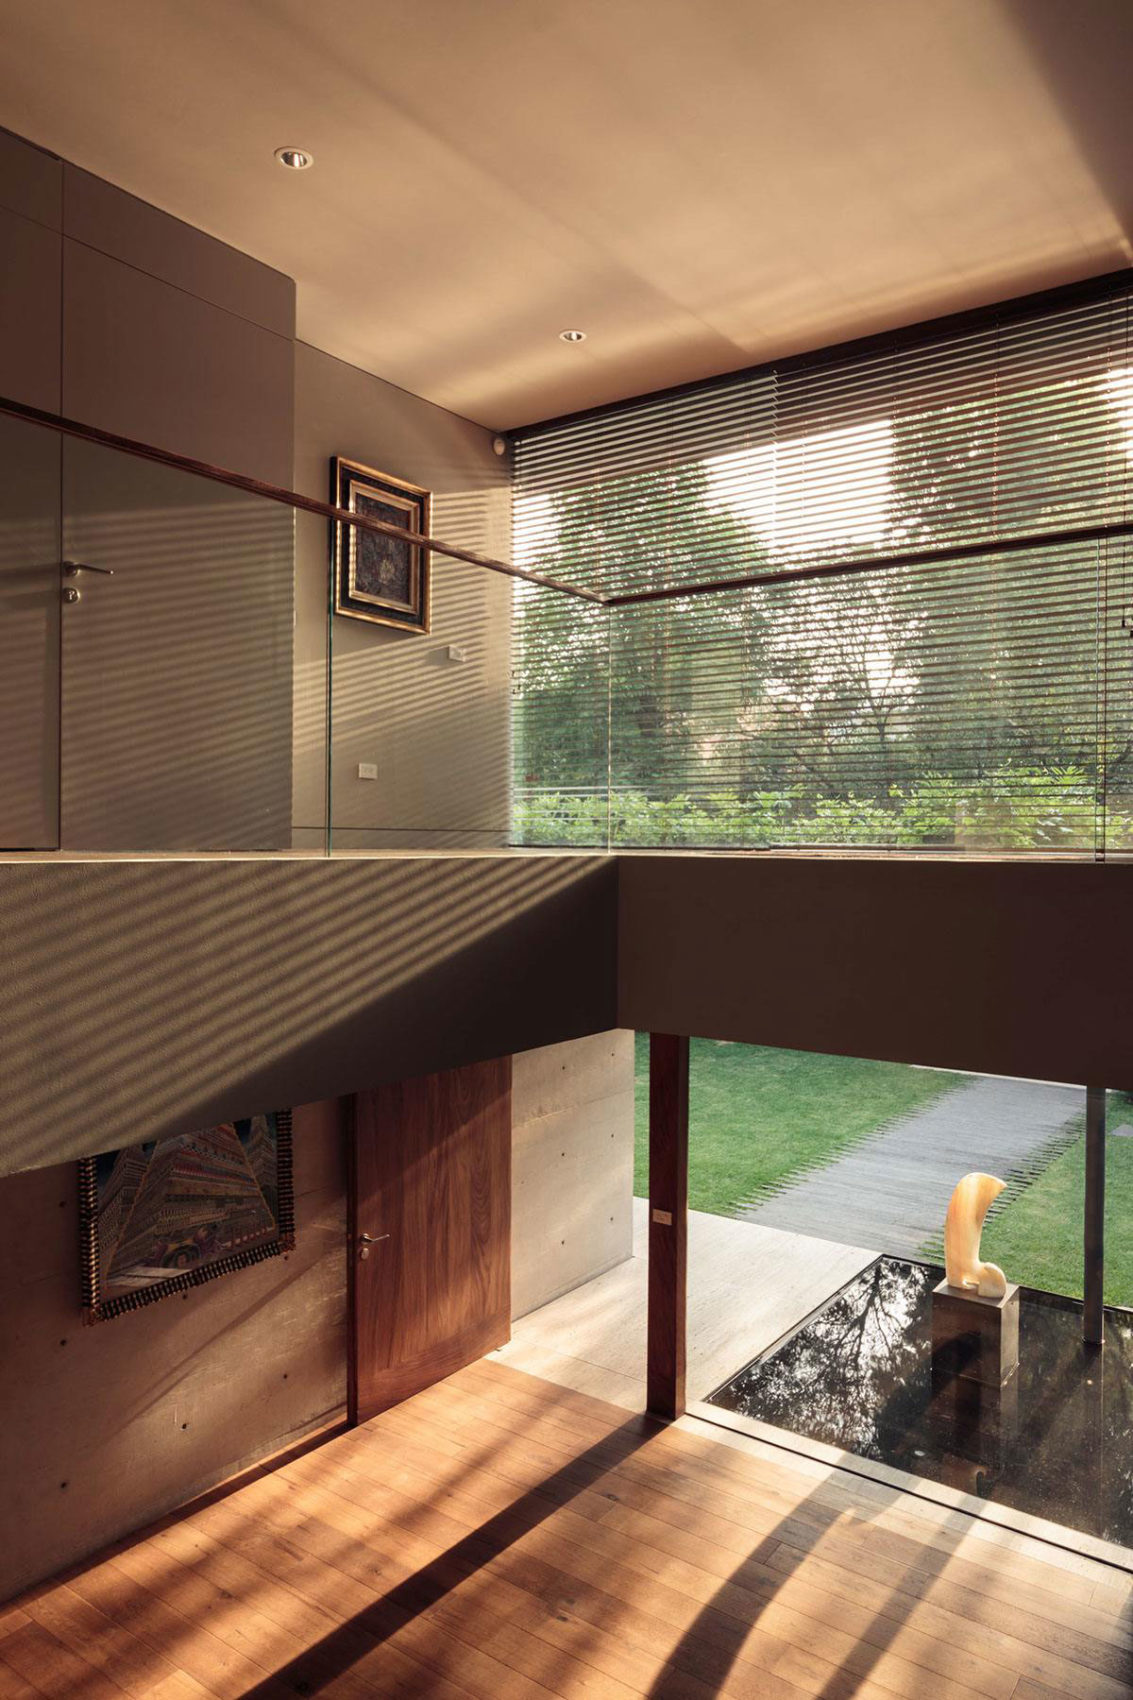 Sierra Fria by JJRR Arquitectura (11)